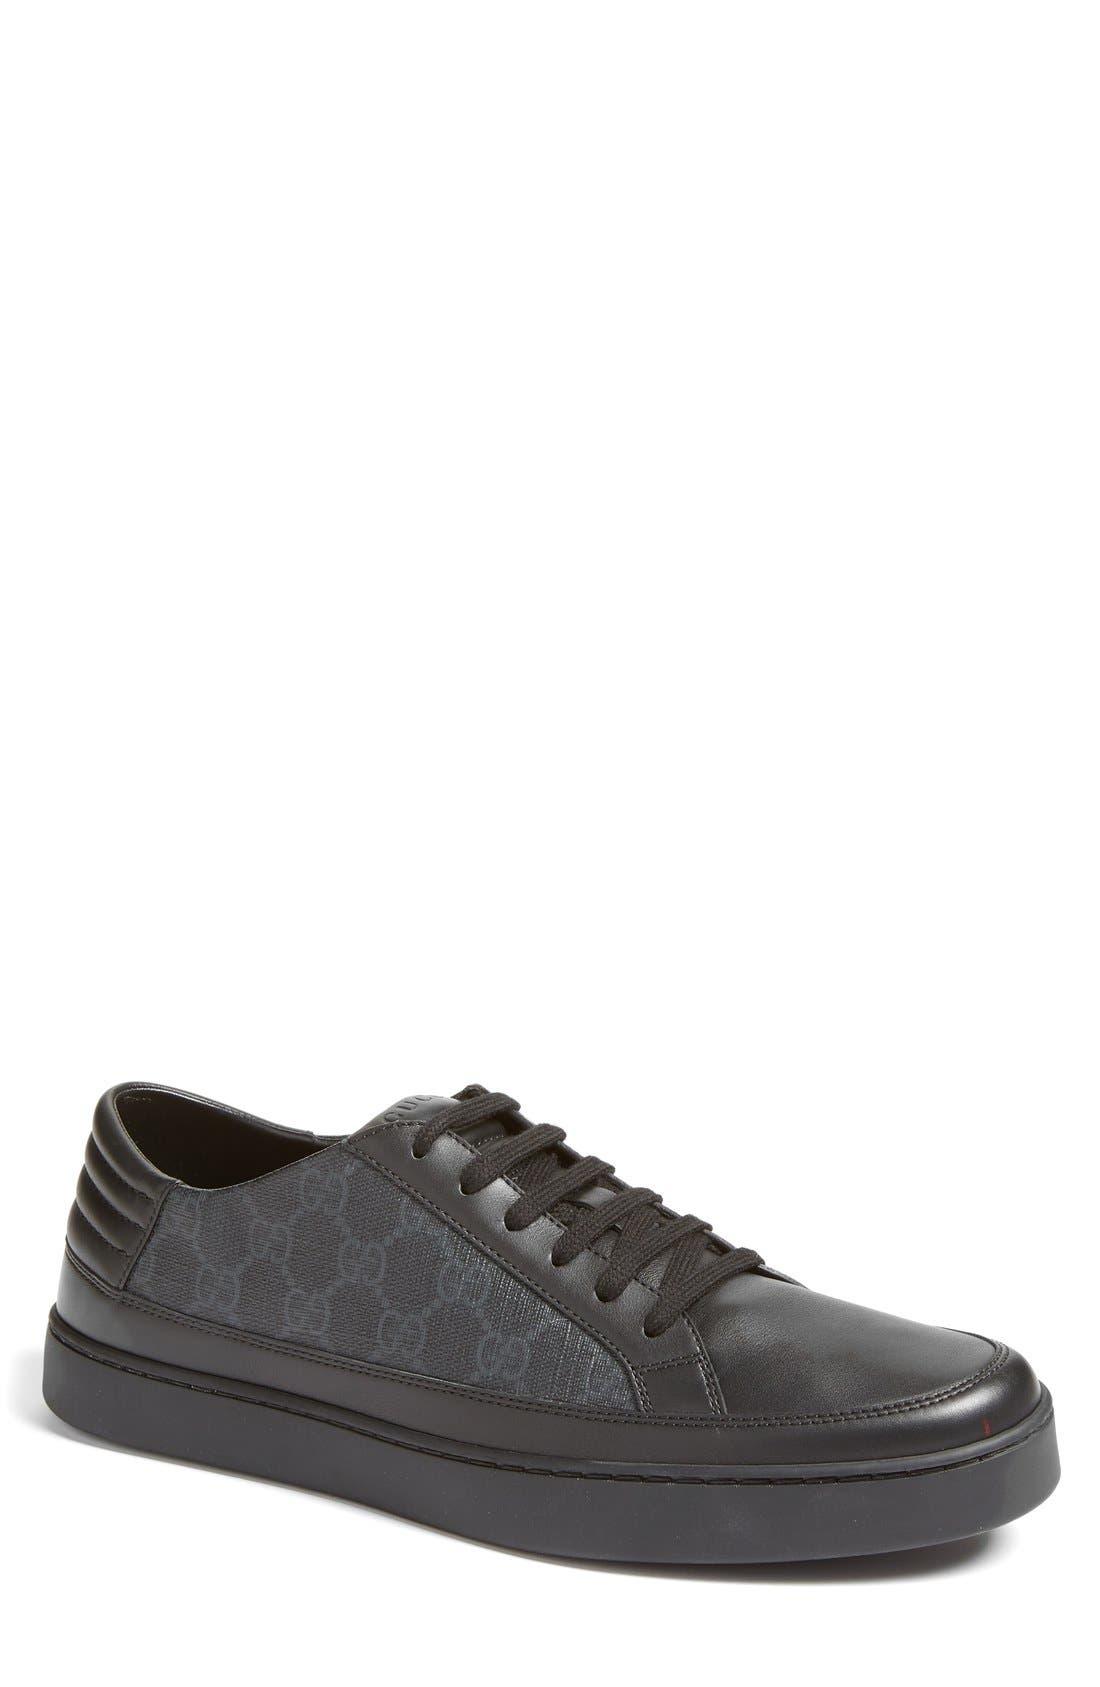 Gucci \u0027Common\u0027 Low-Top Sneaker ...